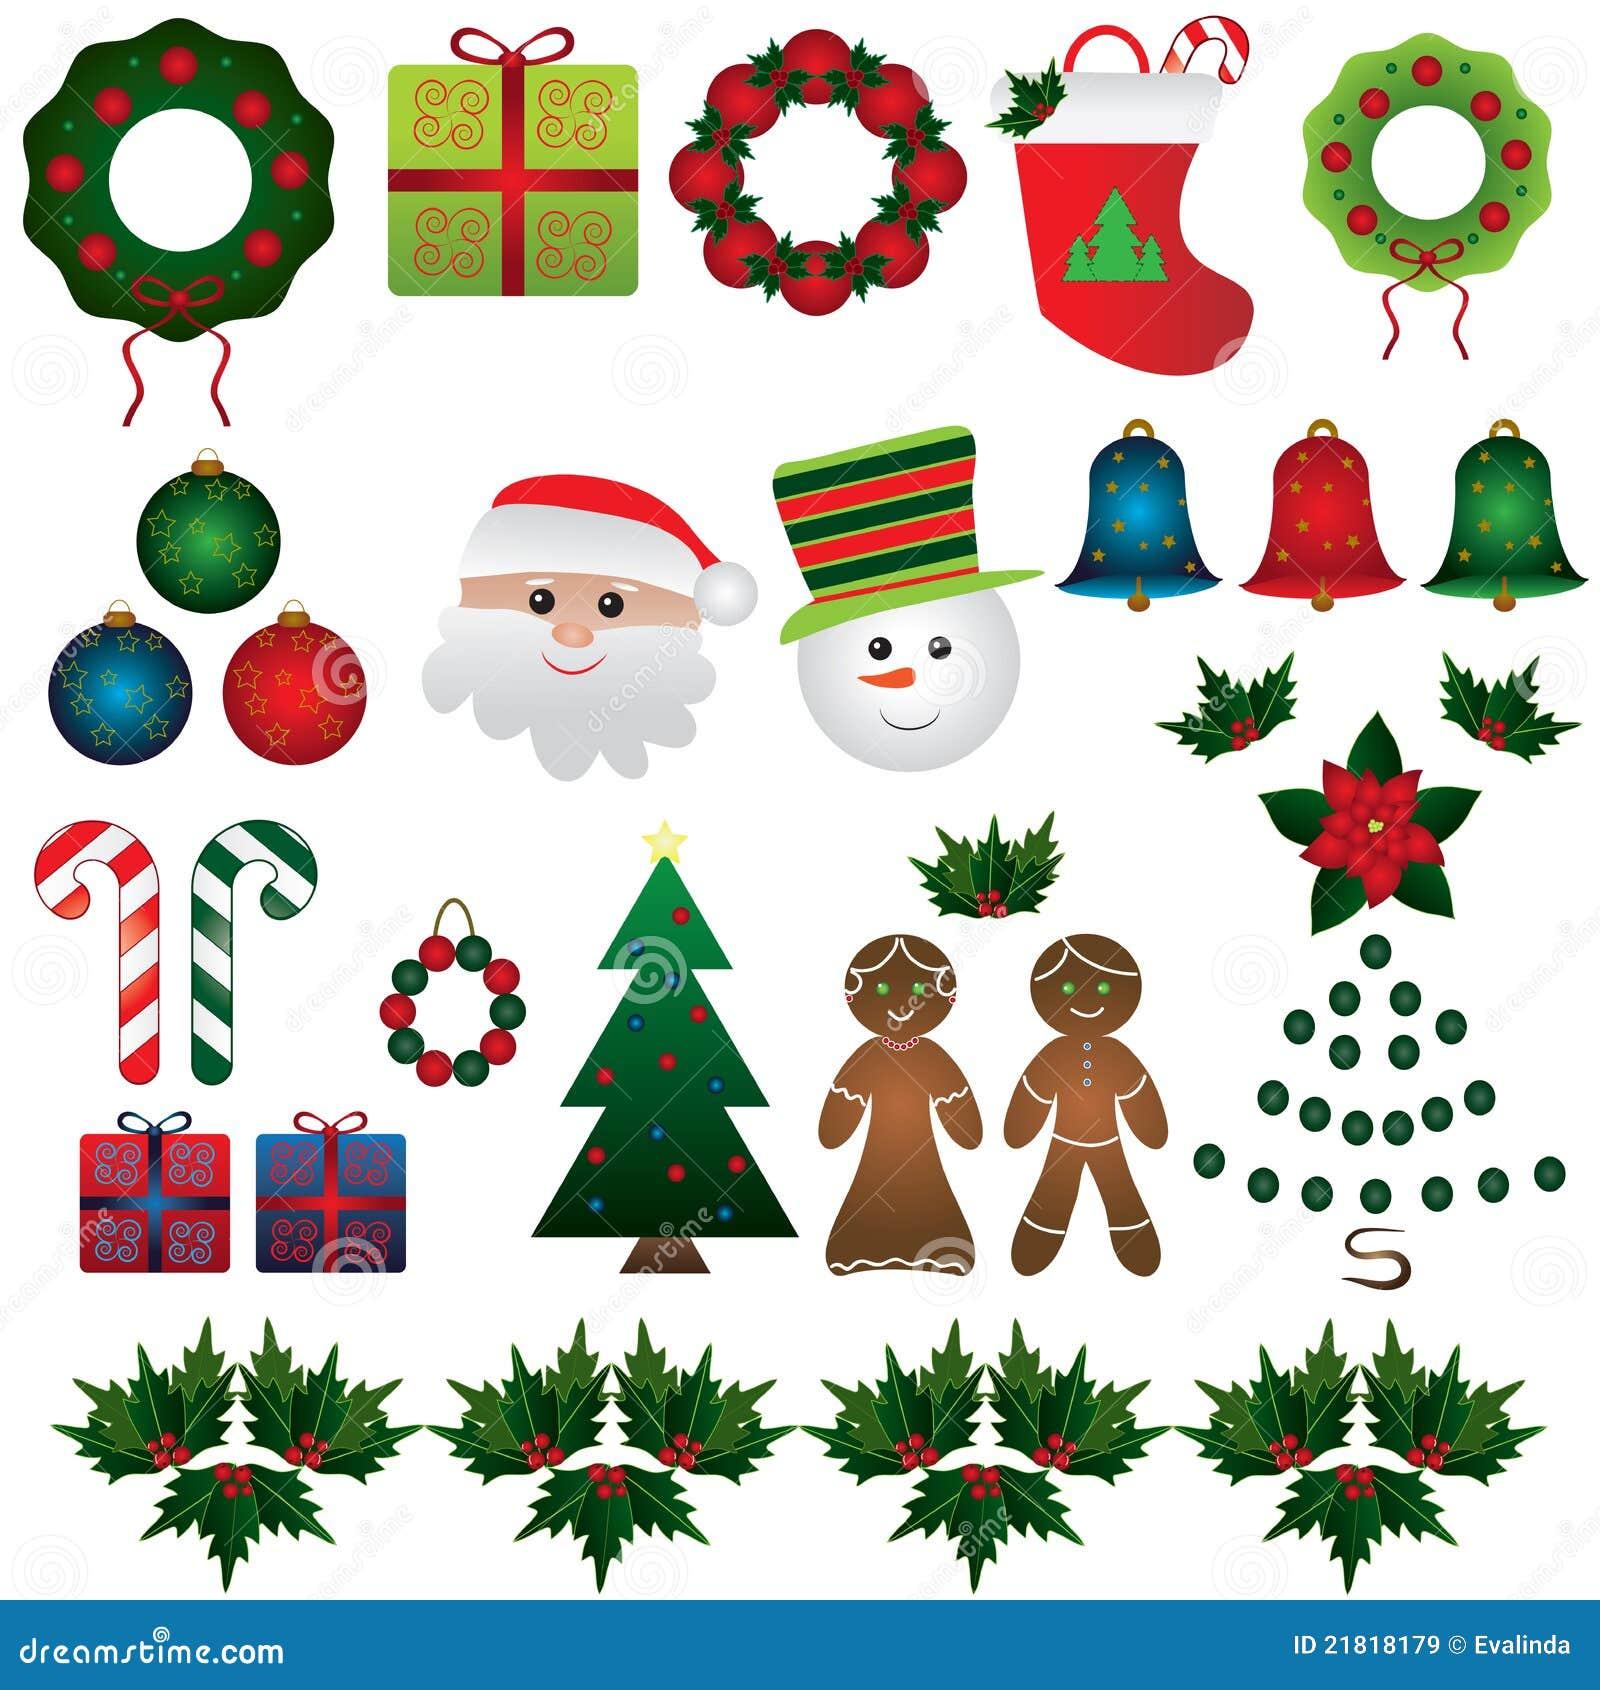 Christmas Set.Christmas Set Stock Vector Illustration Of Artistic 21818179